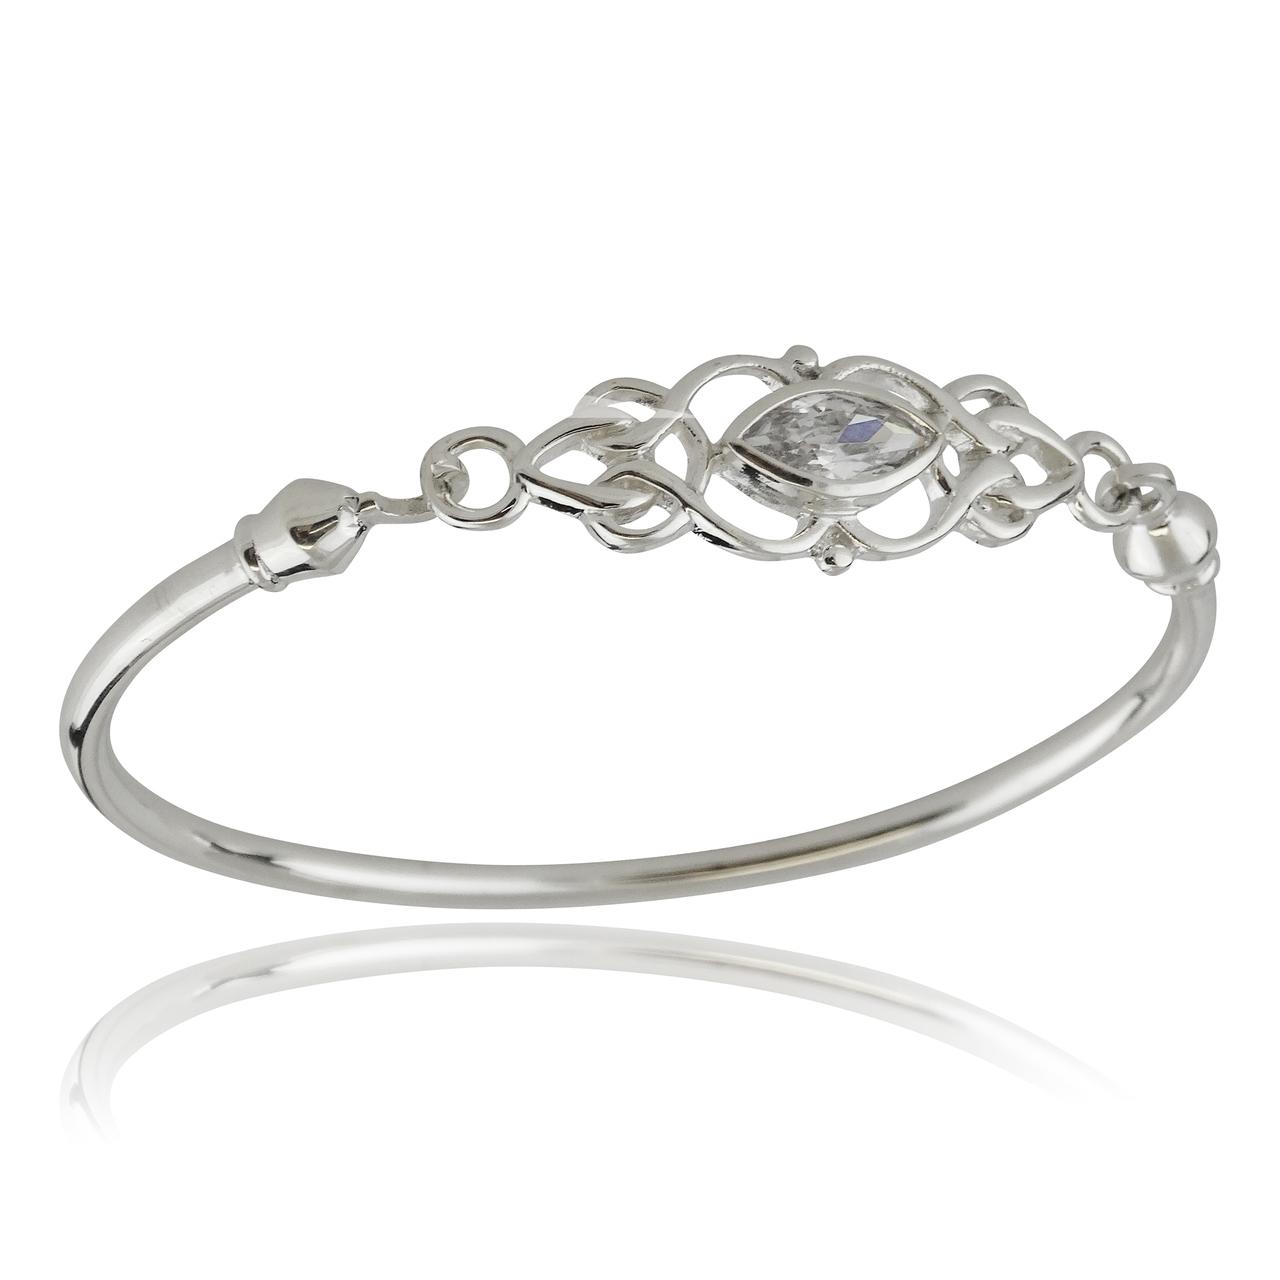 Celtic Knot CZ BANGLE Bracelet - 925 Sterling Silver Marquis